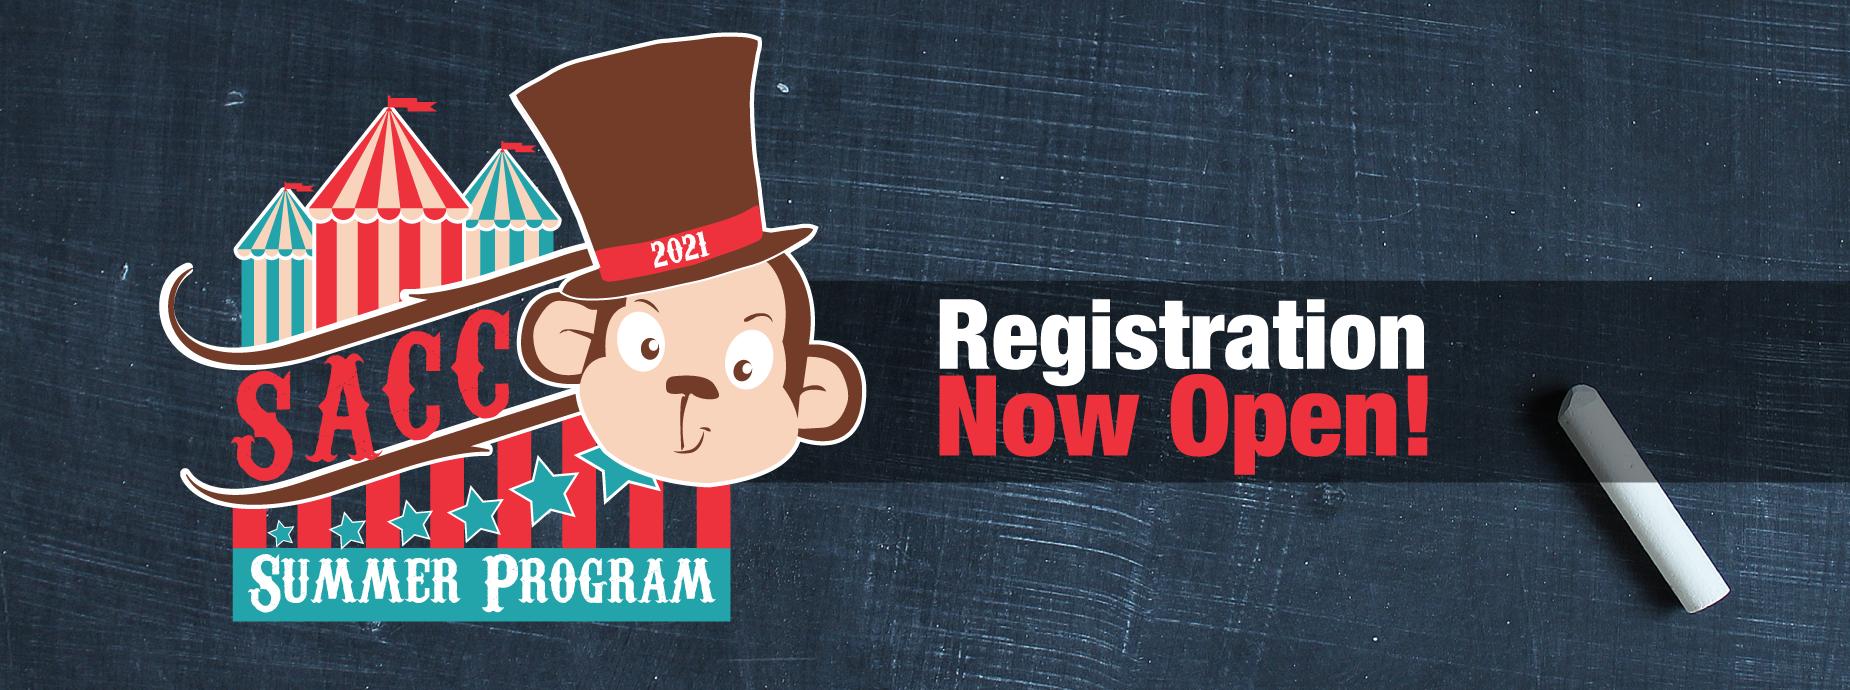 SACC Summer Program Registration Open Banner